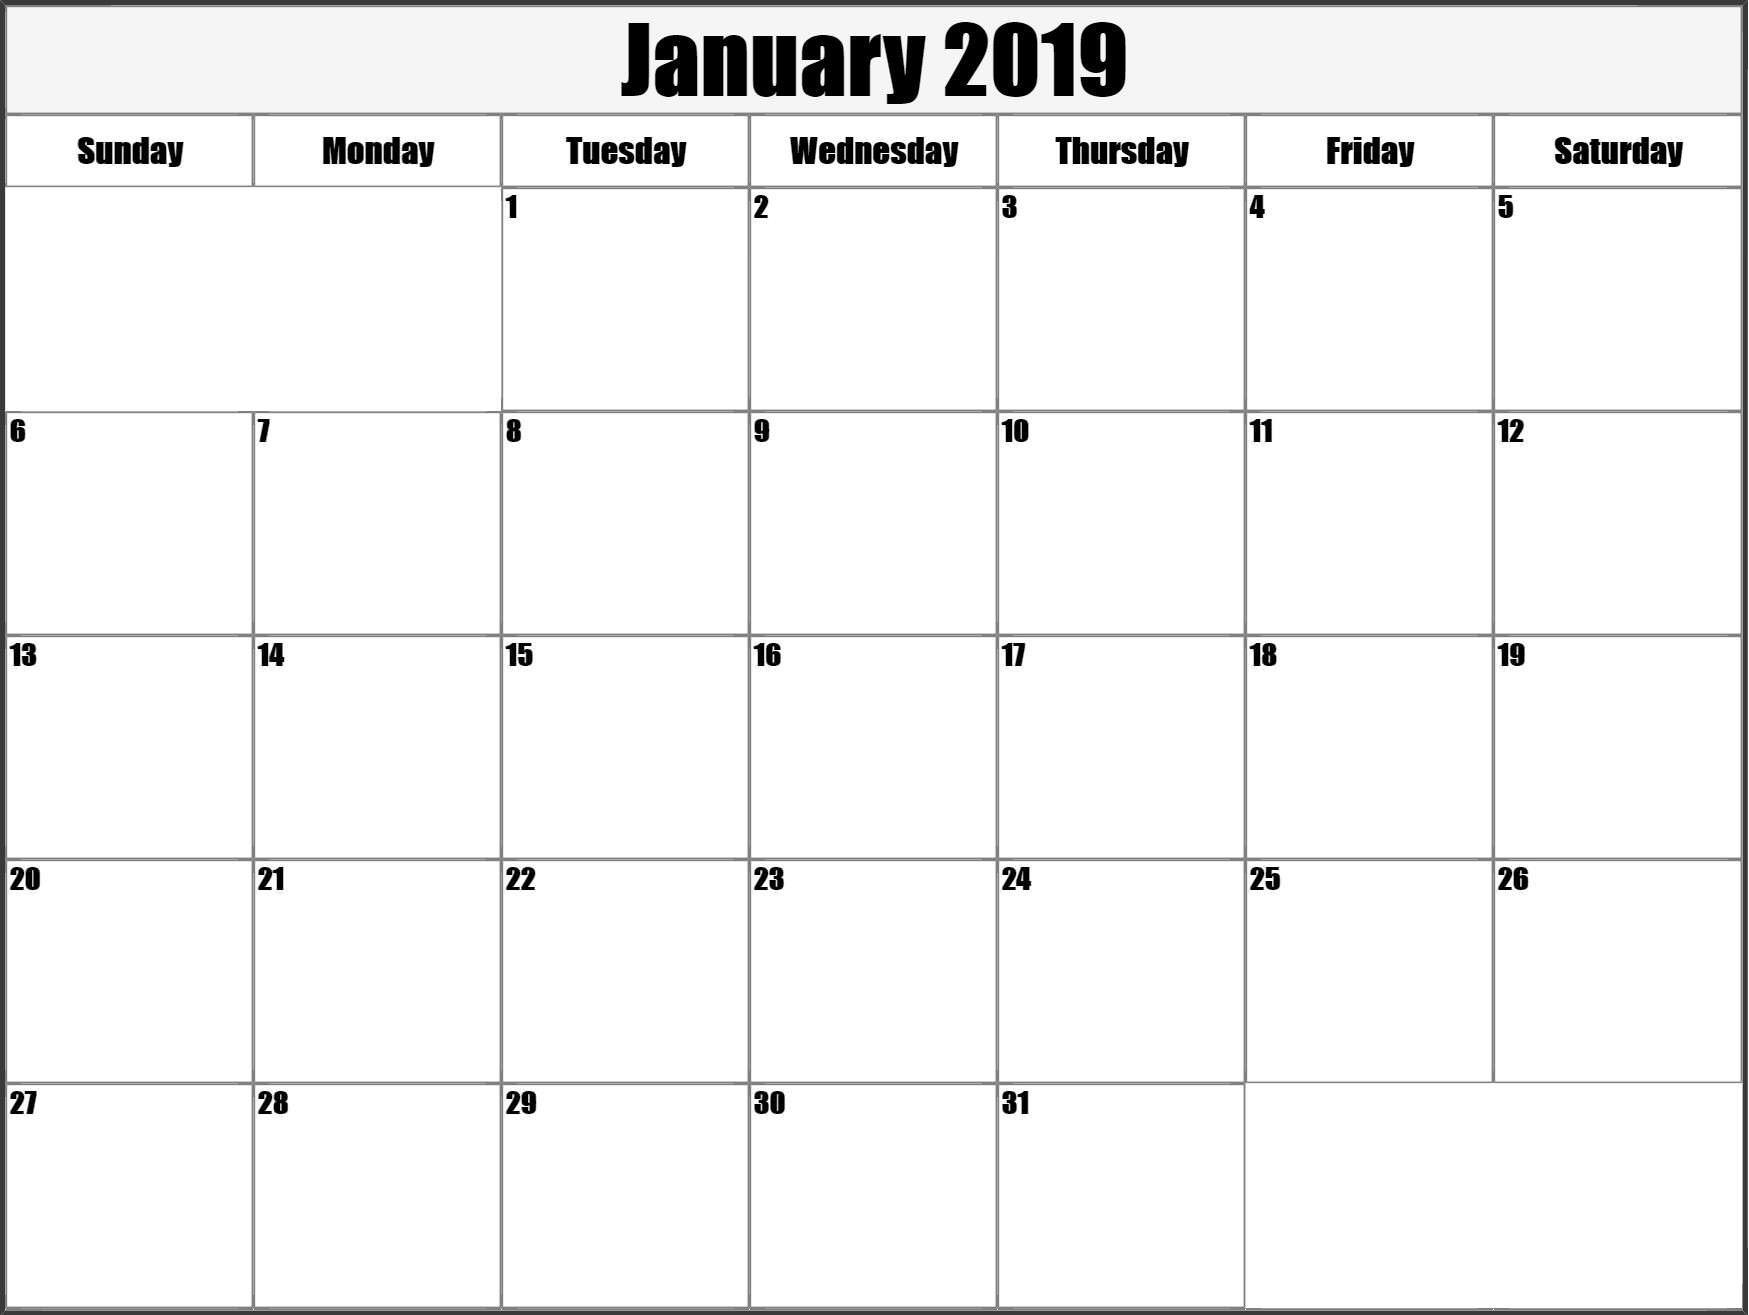 Large Square Calendar Printable | Calendar Template 2021 within 2021 Calendar Printable Large Squares